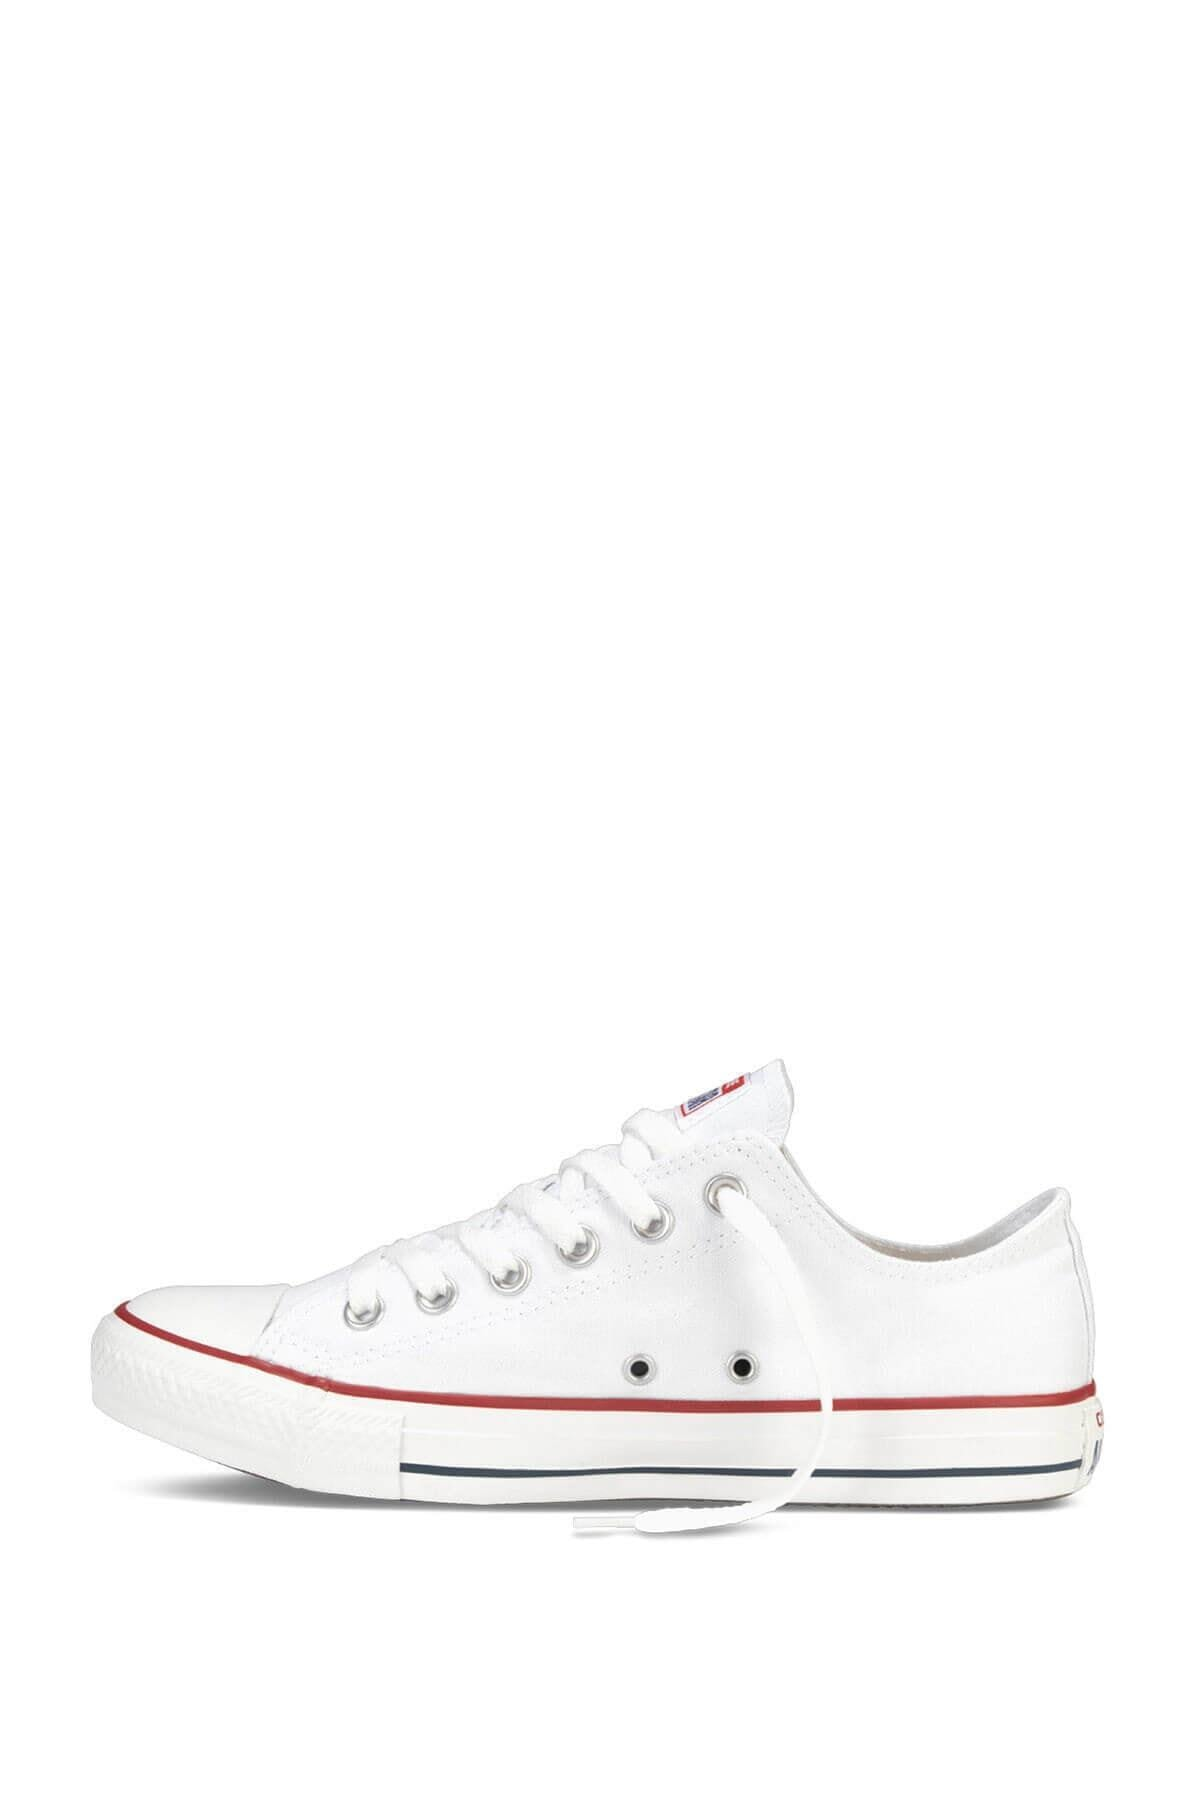 converse Unisex Sneaker M7652 Chuck Taylor Allstar - M7652c 2